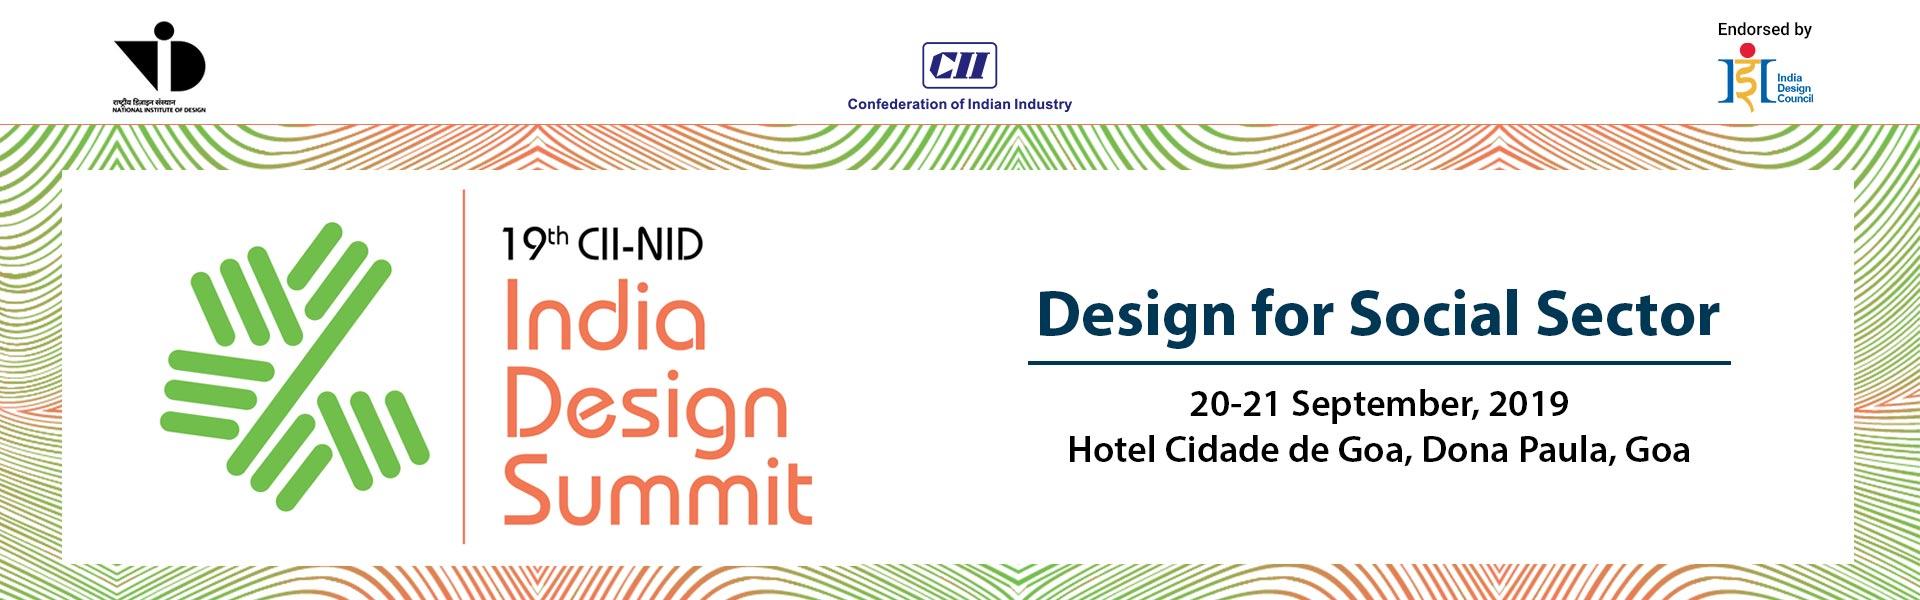 CII Awards 2019, Design Excellence Awards 2019